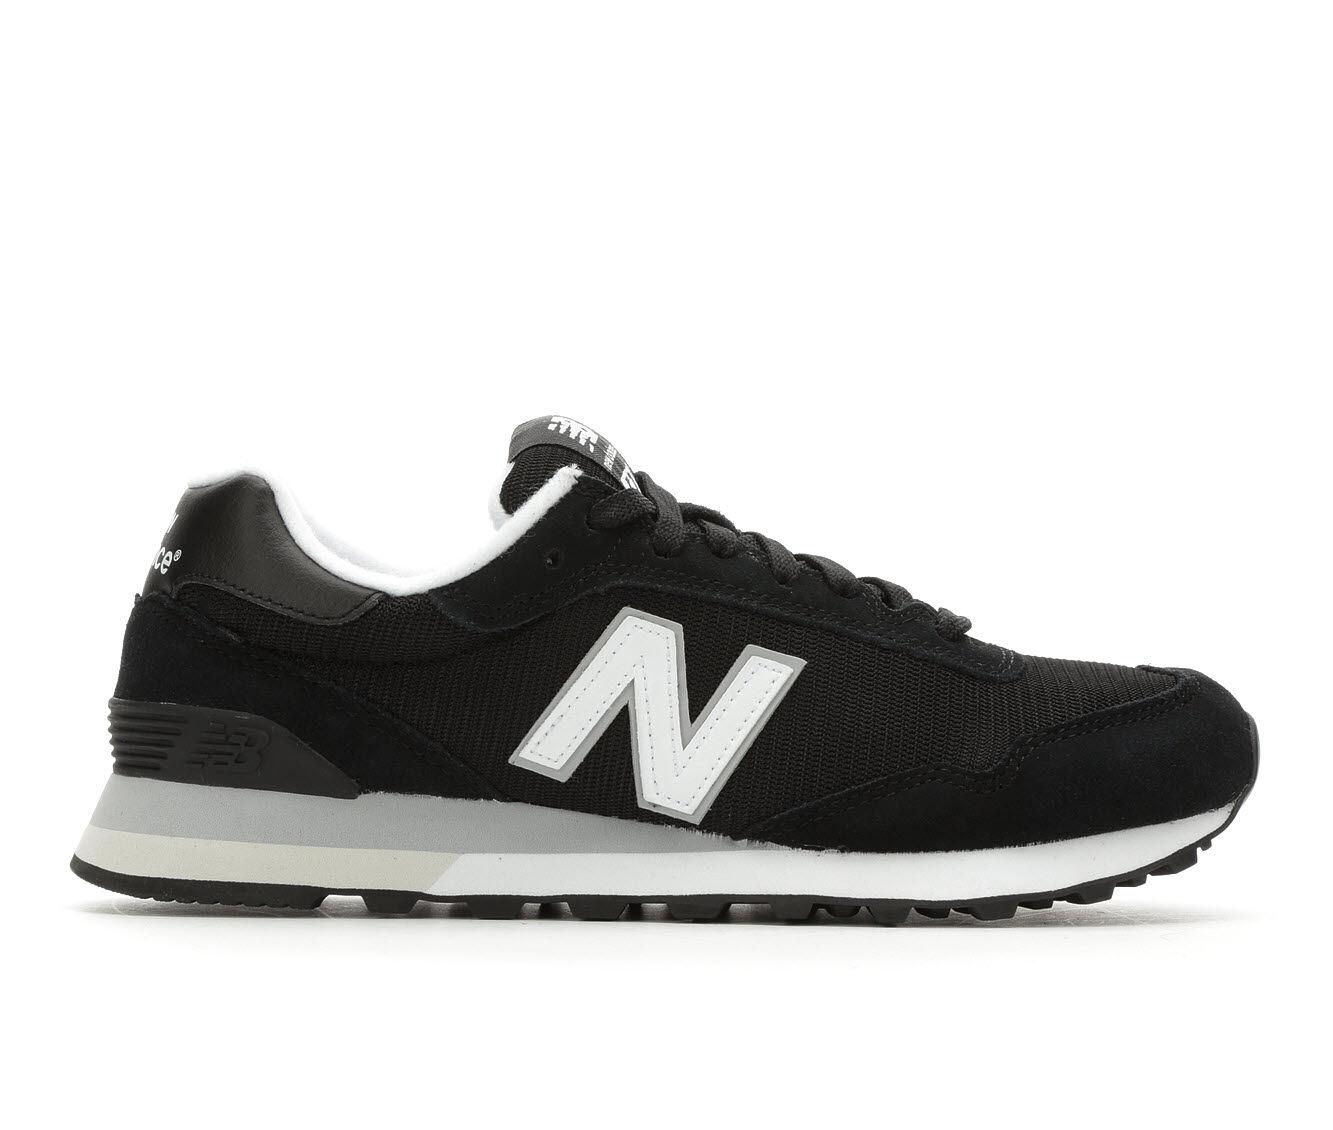 Designer For Sale Men's New Balance ML515 Retro Sneakers Blk/Wht/Gry